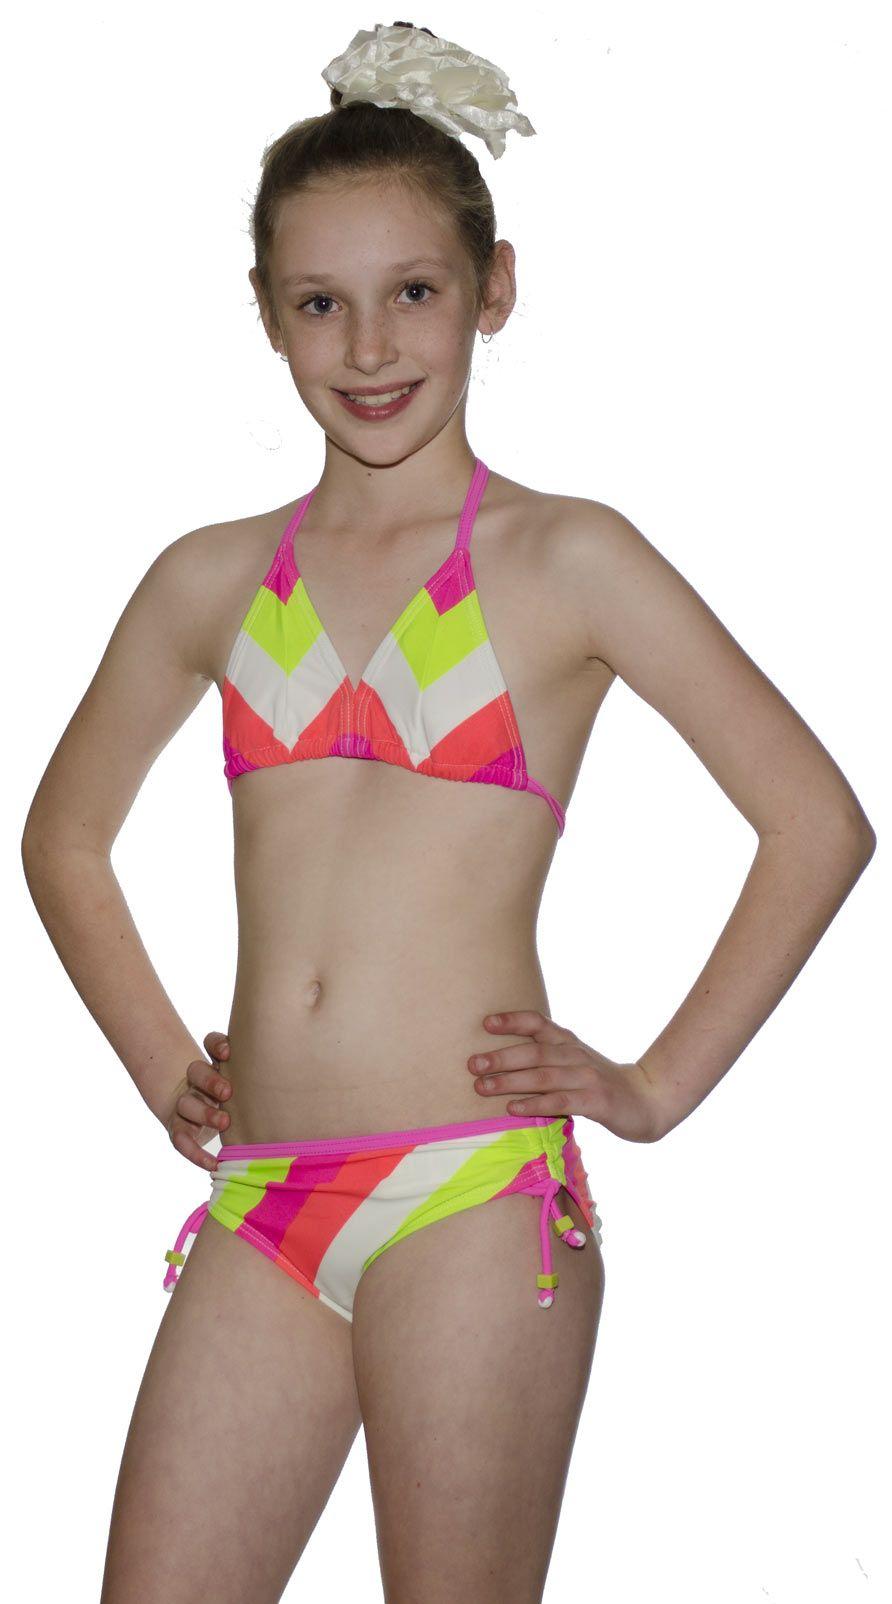 d6be3256b9 Bikini www.amazon.com shops writer clothing for children